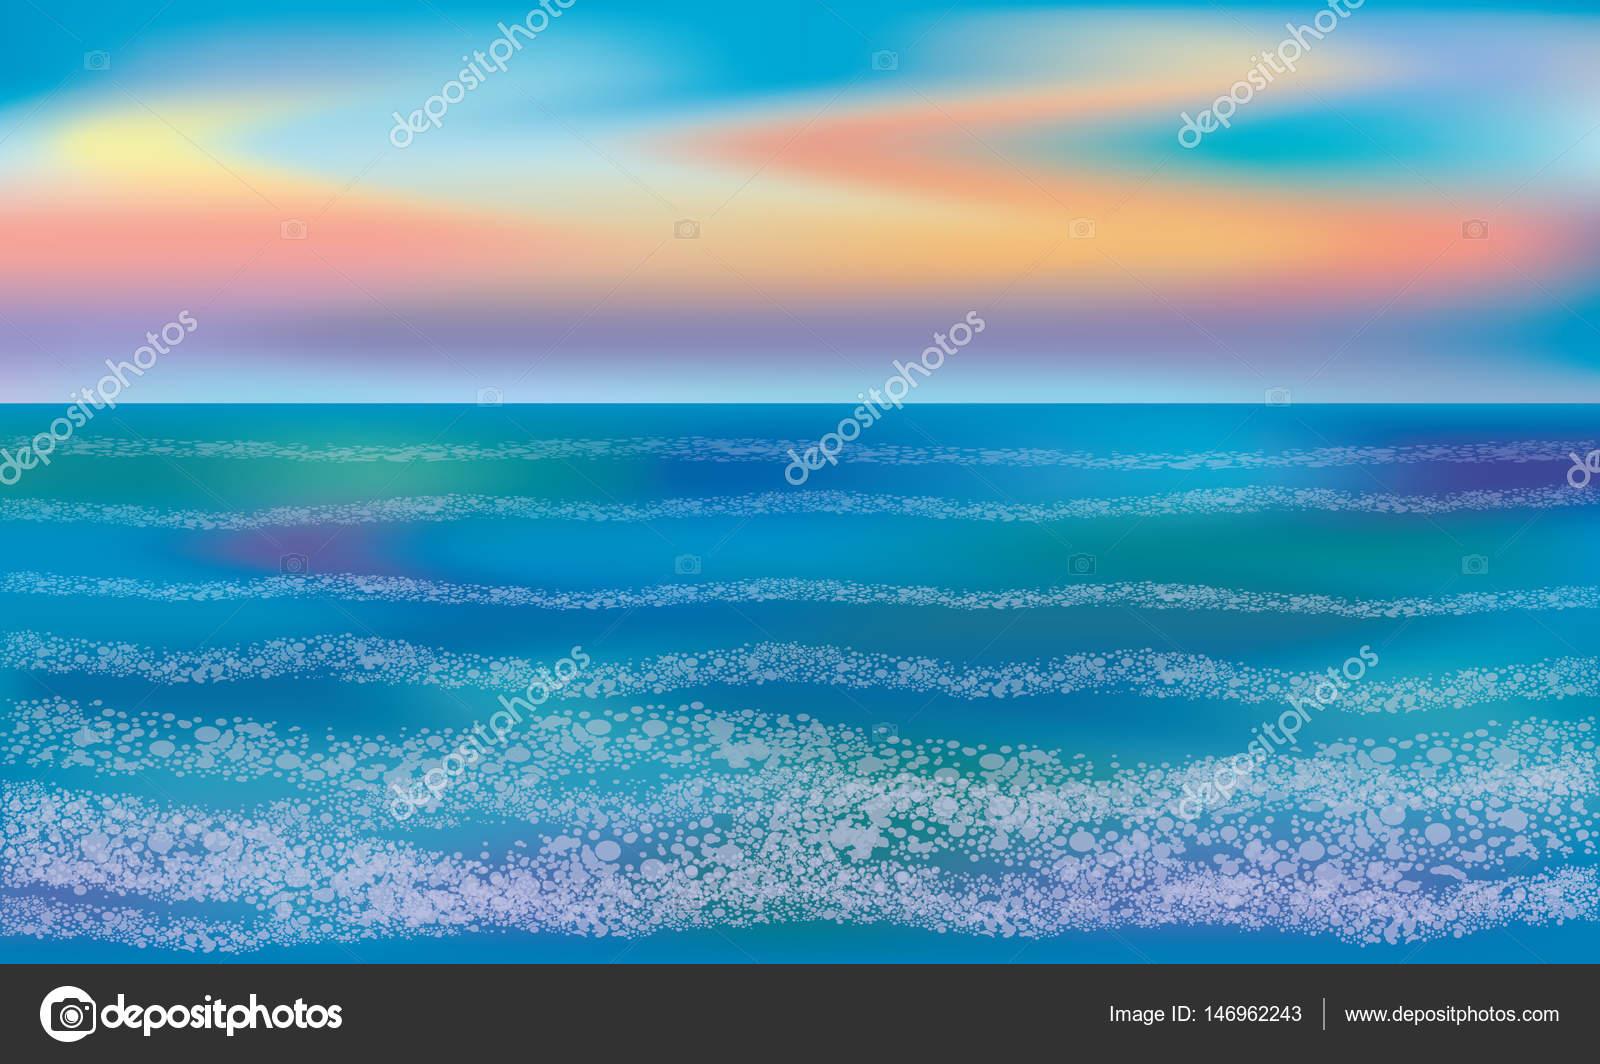 Sea Wallpaper Vector Illustration Stock Vector C Carodi 146962243